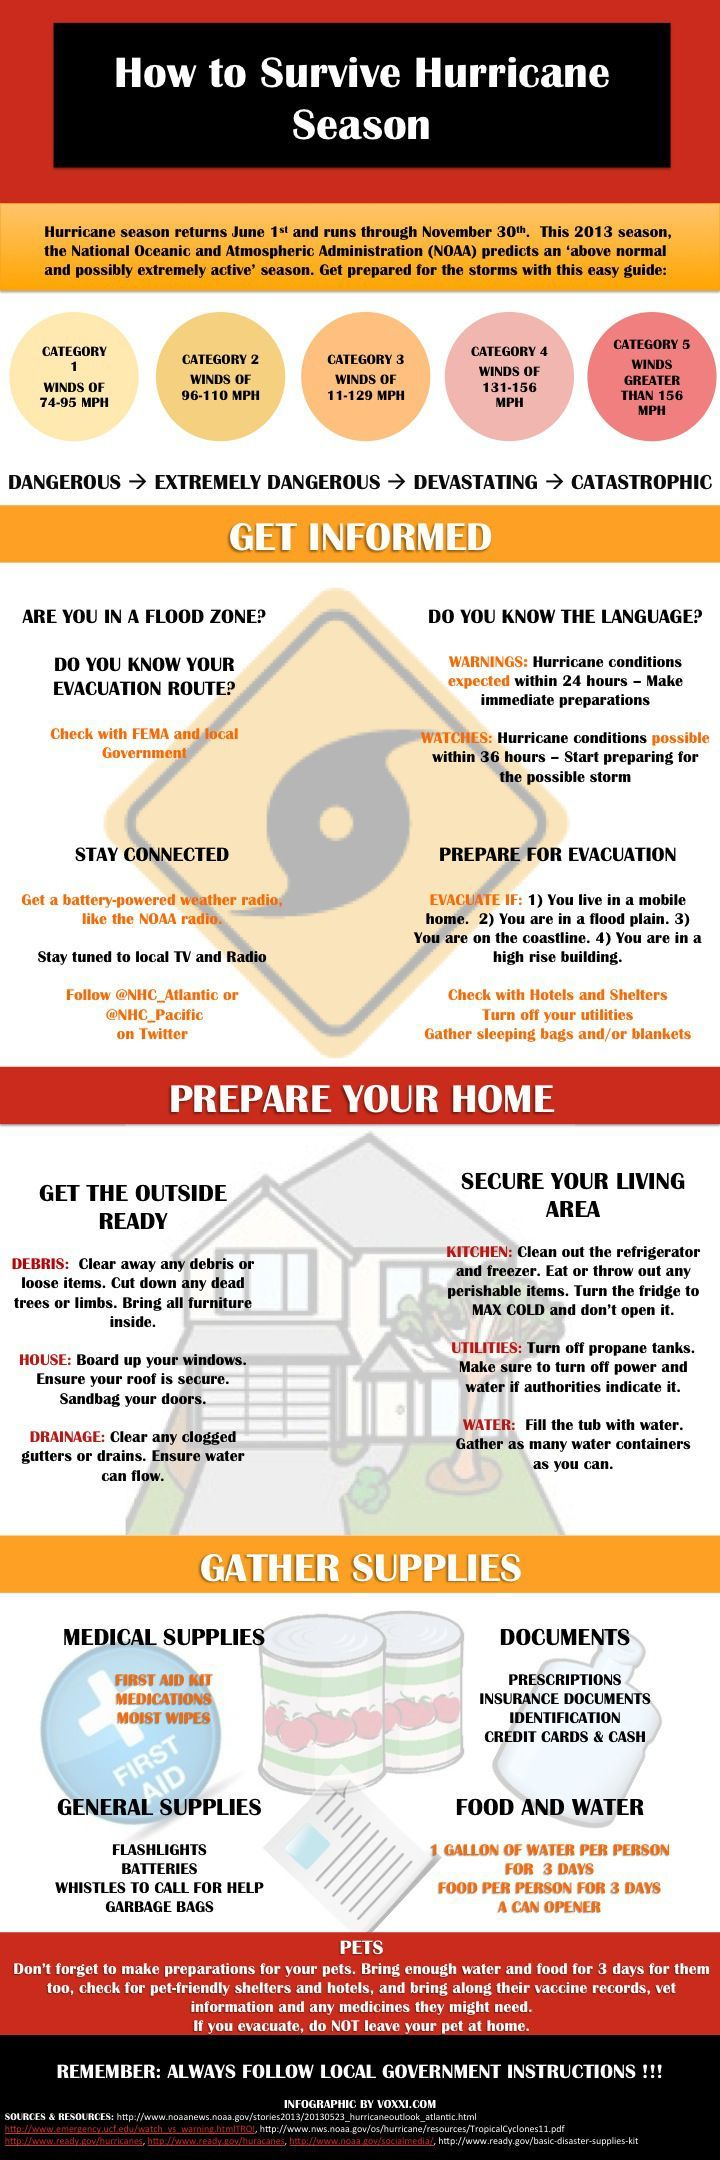 How to Survive Hurricane Season   some key information about hurricane preparedness #survivallife http://www.survivallife.com